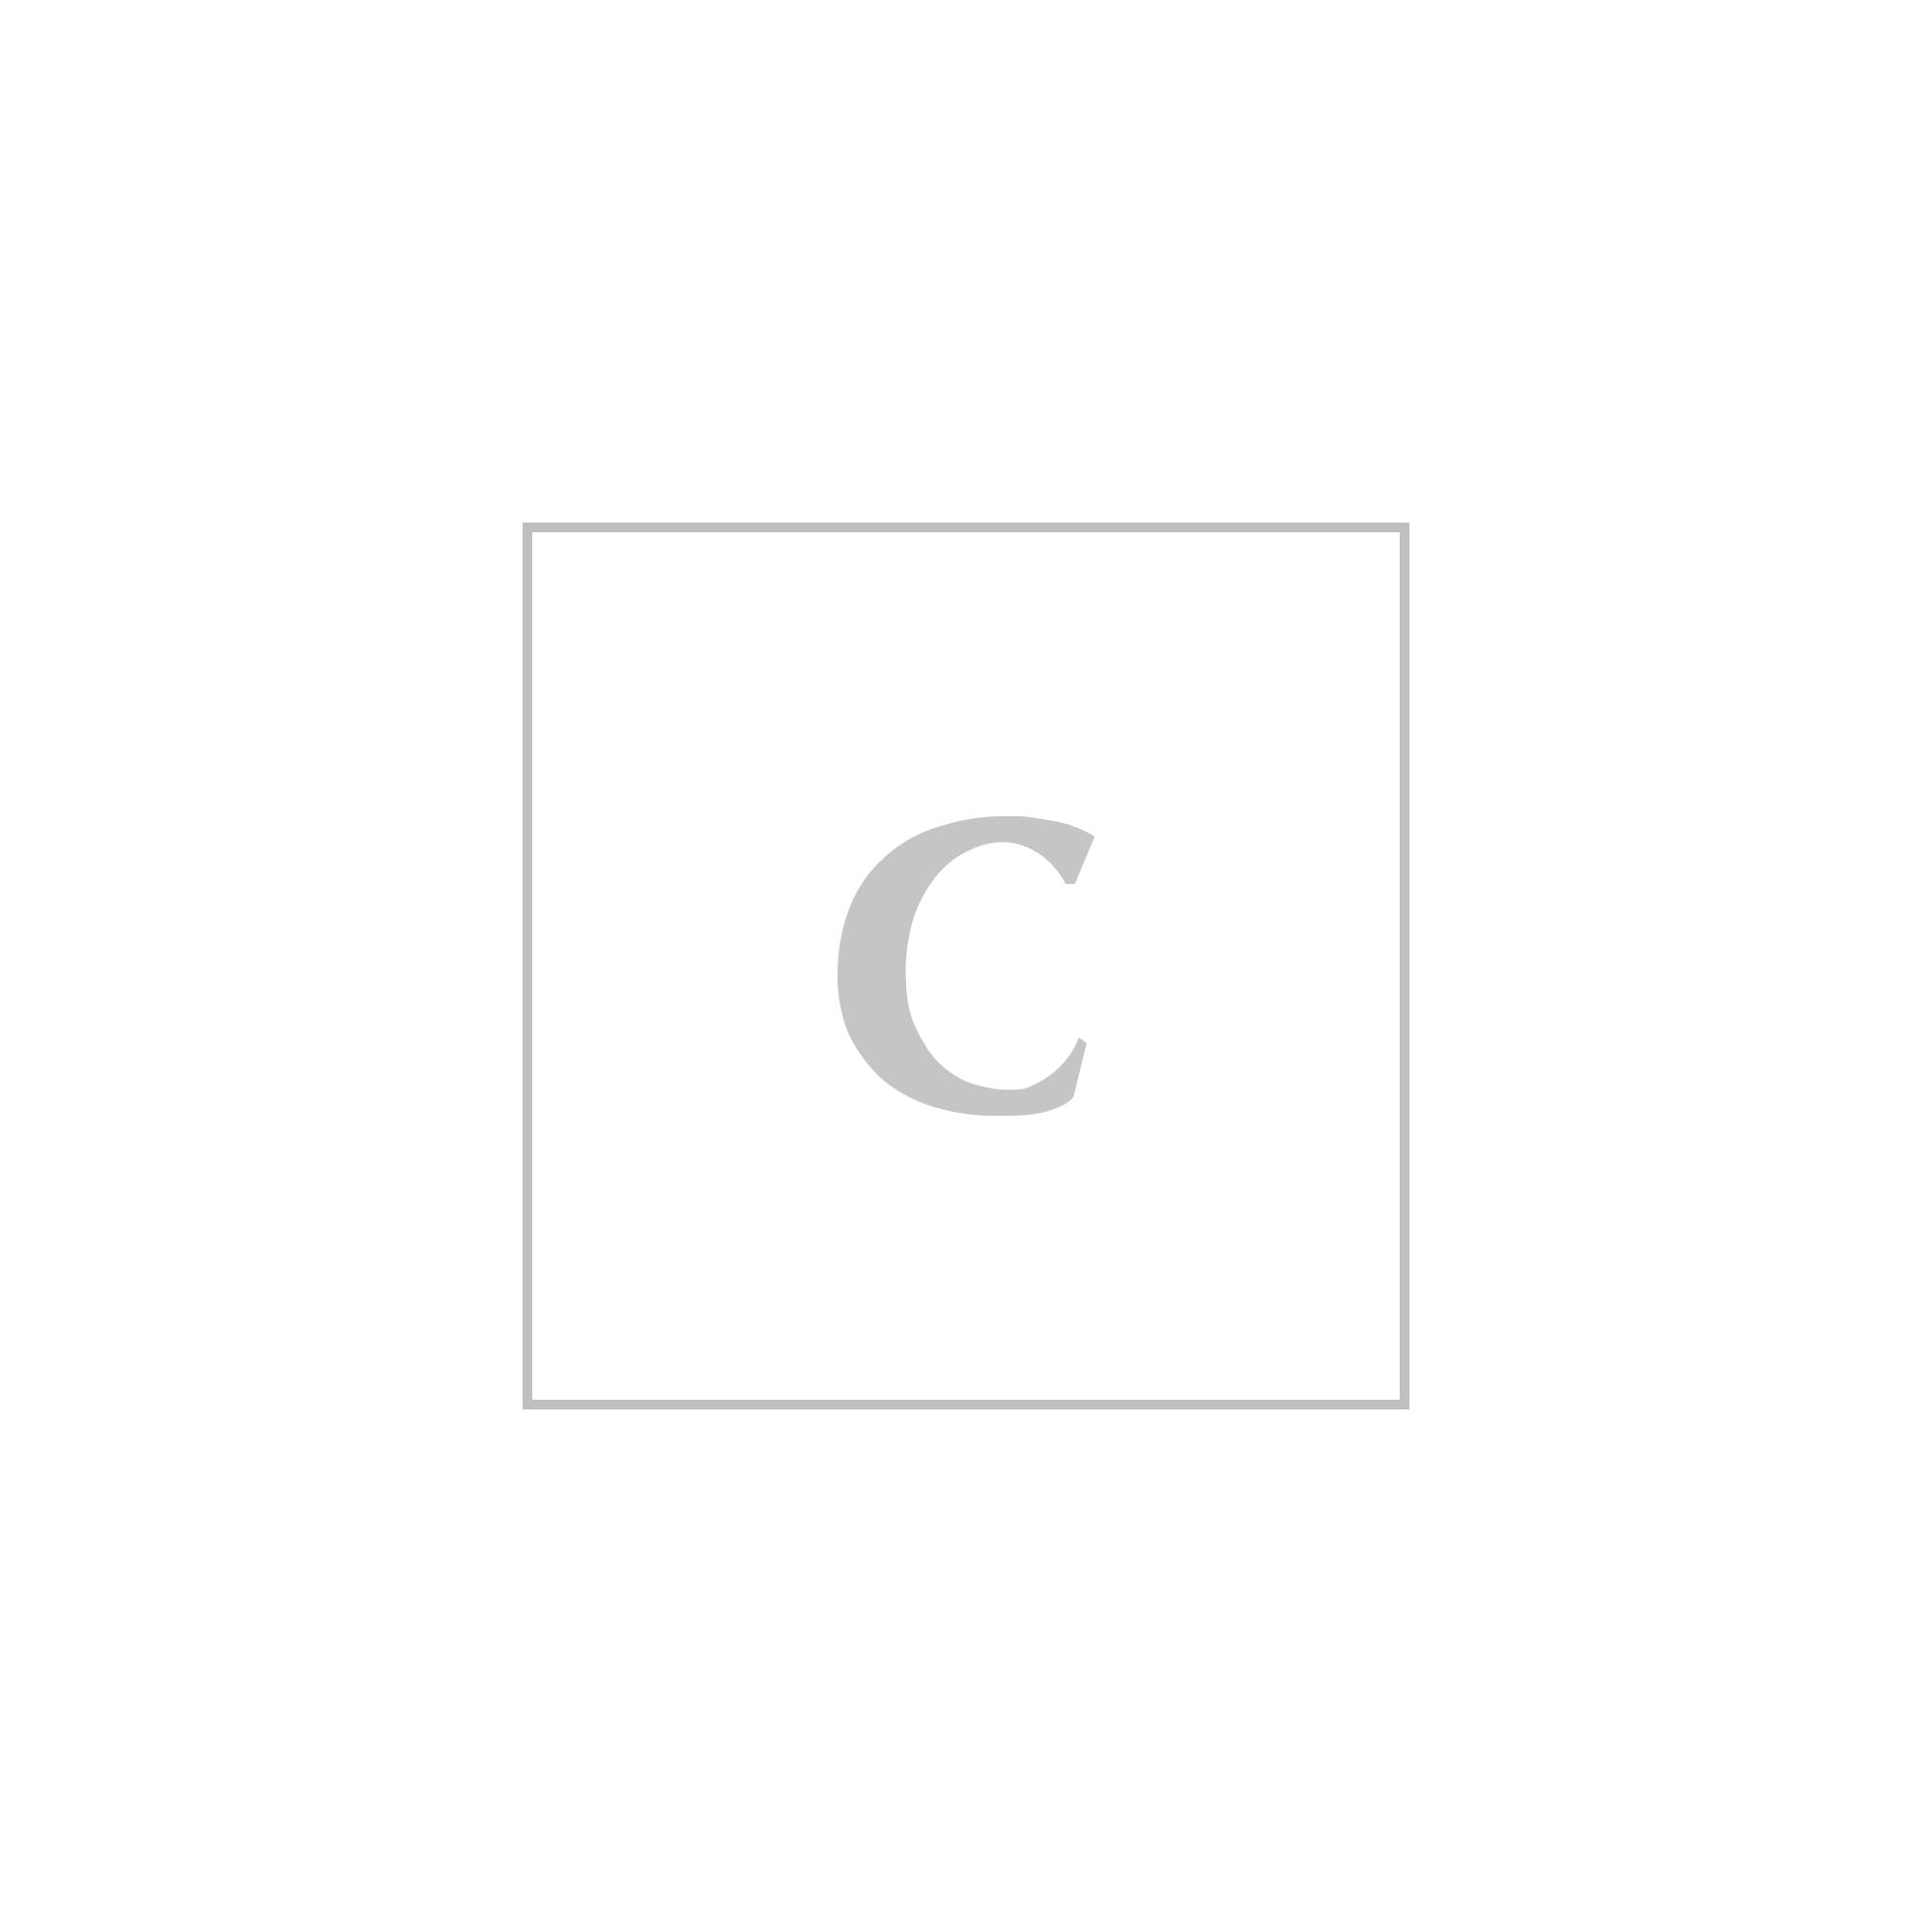 Saint laurent mini clutch monogram